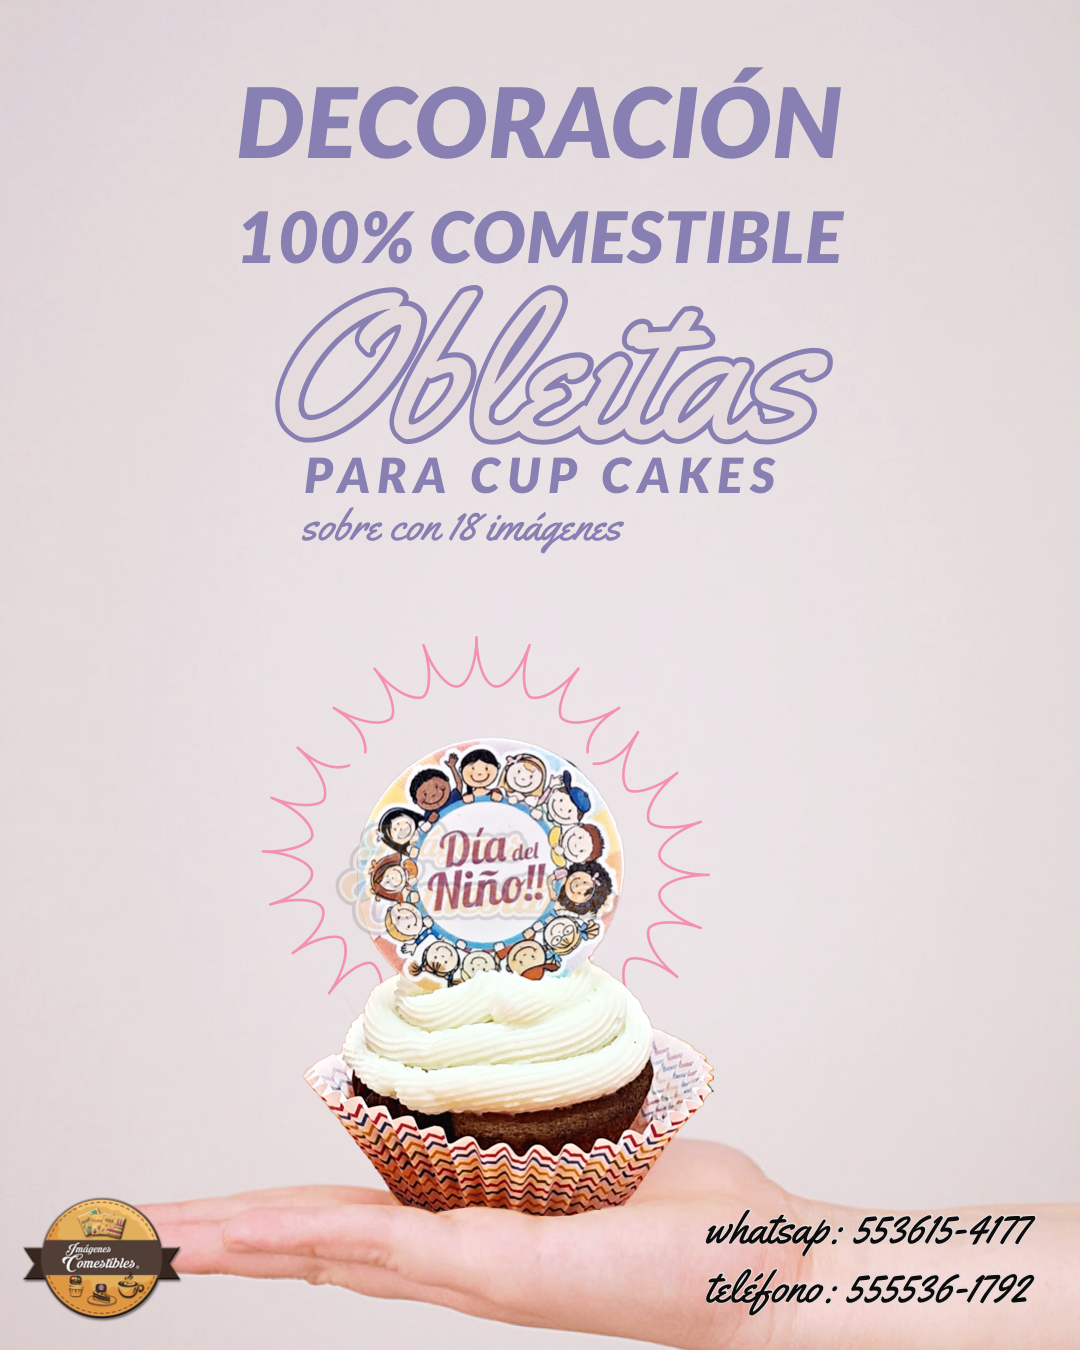 https://0201.nccdn.net/4_2/000/000/04b/787/decoracio%CC%81n-100--comestible-obleitas-.png